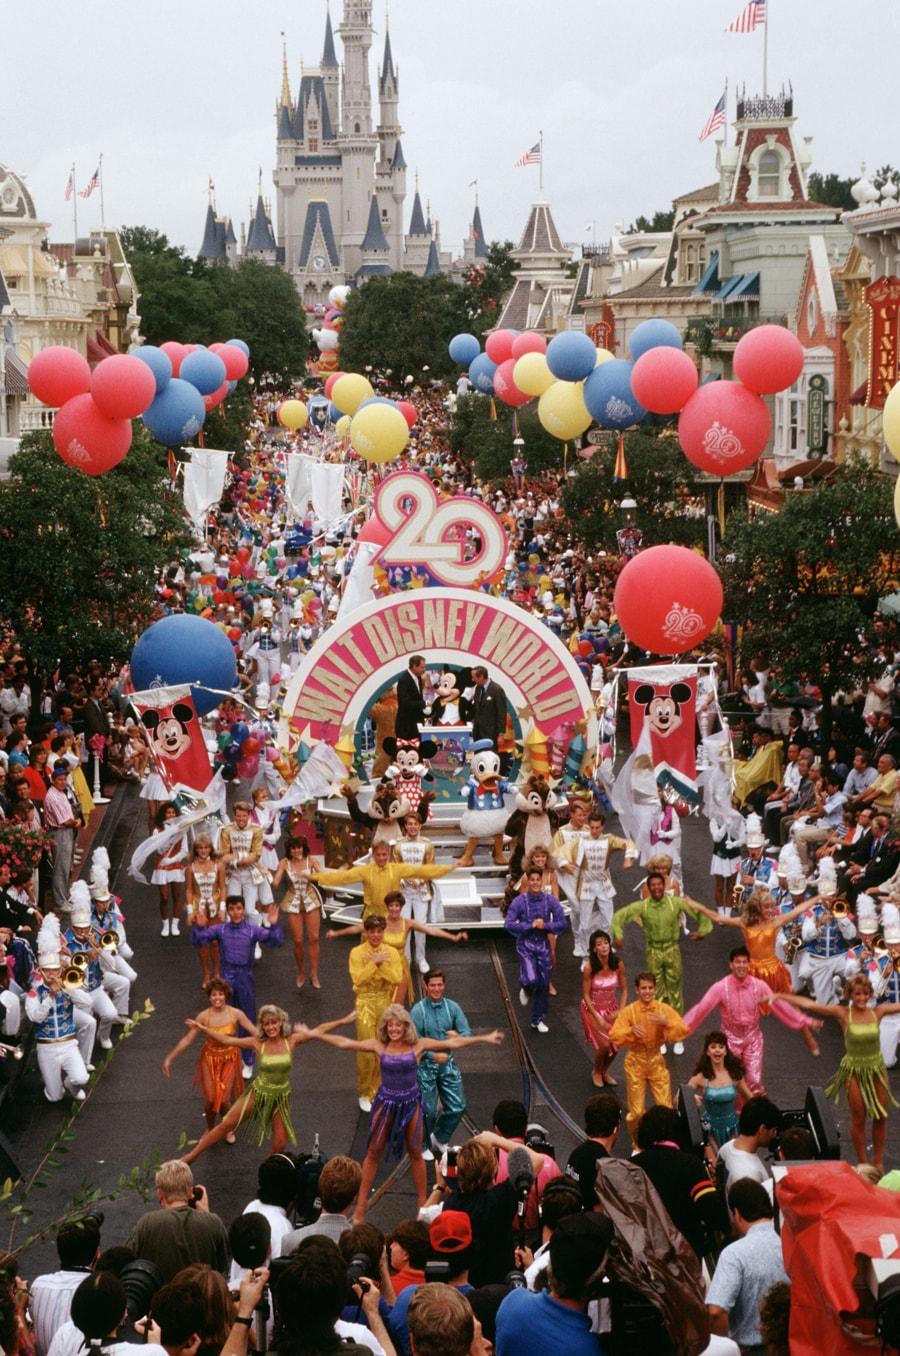 Celebration Of Signs And Marks Human >> Vintage Walt Disney World Magic Kingdom Park Marks 20 Years